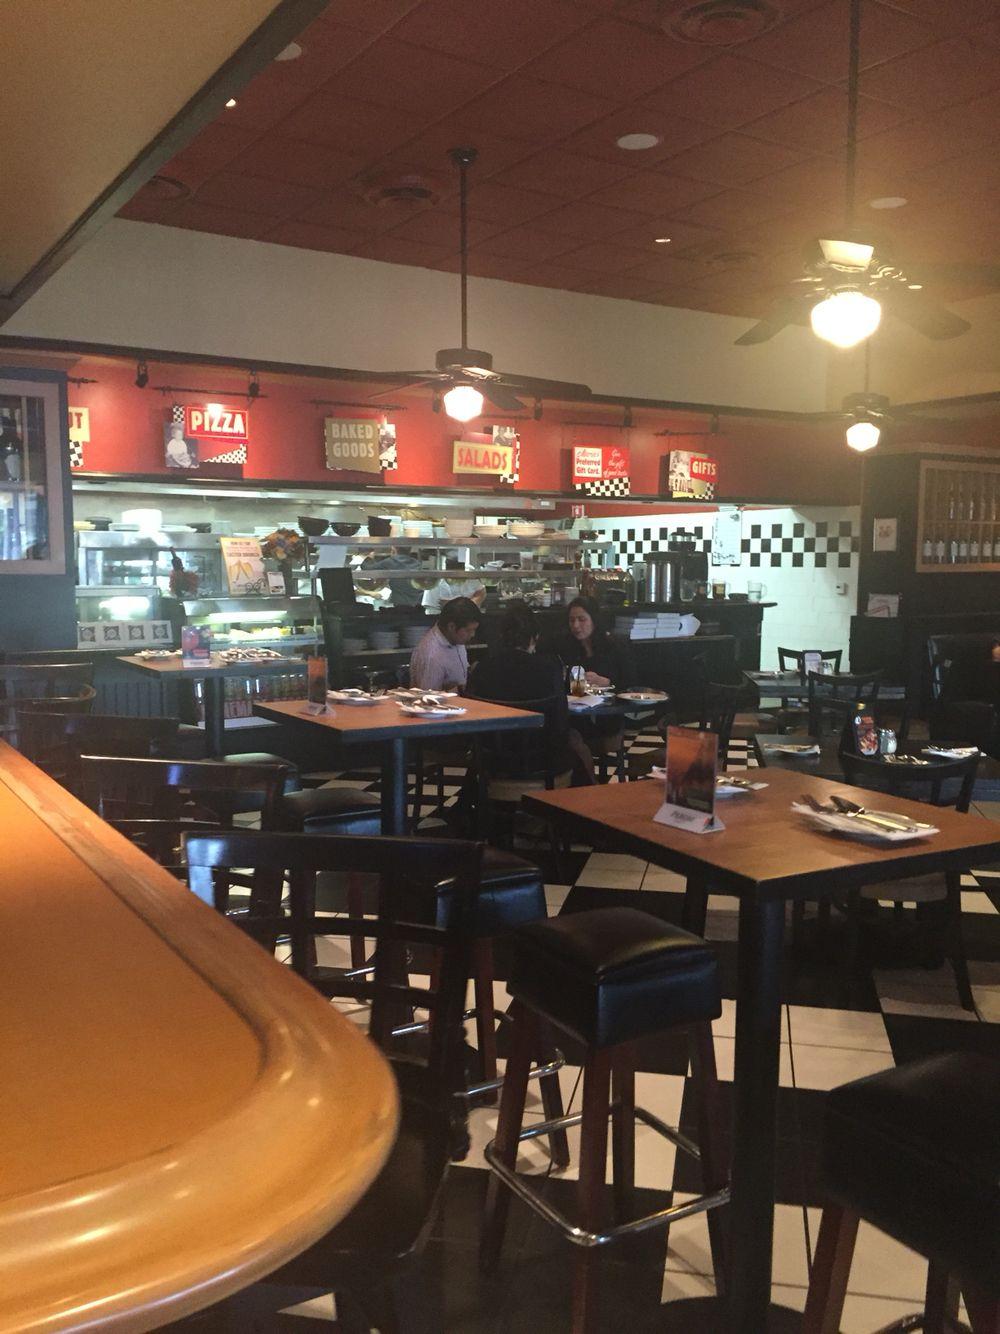 Mariau0027s Italian Kitchen: Pasadena, CA Second Dining Area As You Walk Through